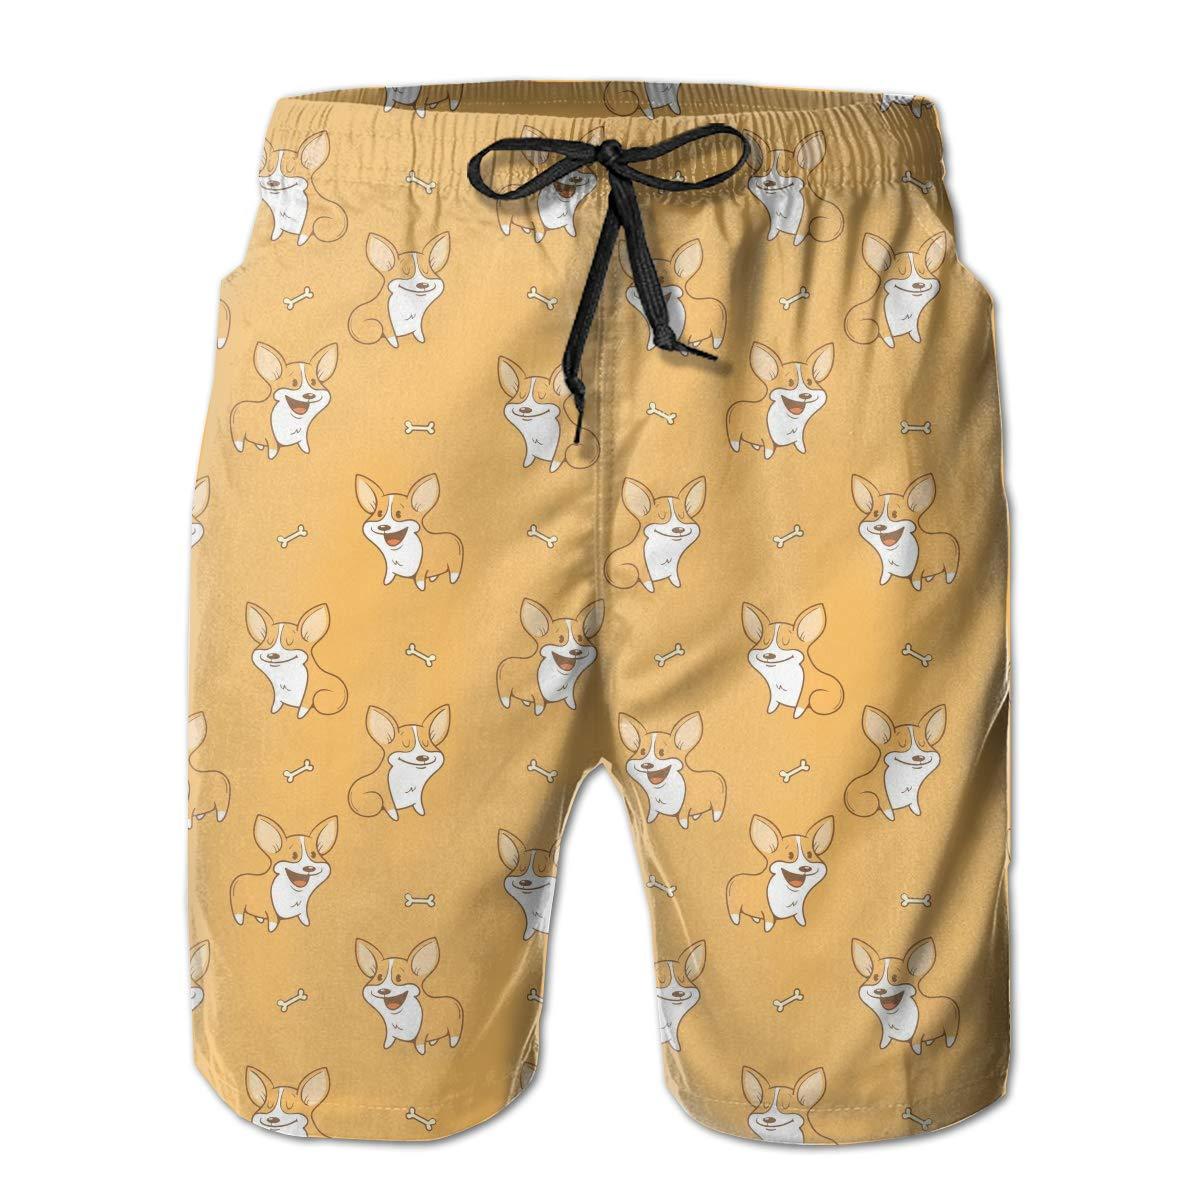 HZamora/_H Mens Cute Cartoon Corgi Dogs Bones Summer Breathable Quick-Drying Swim Trunks Beach Shorts Board Shorts XL